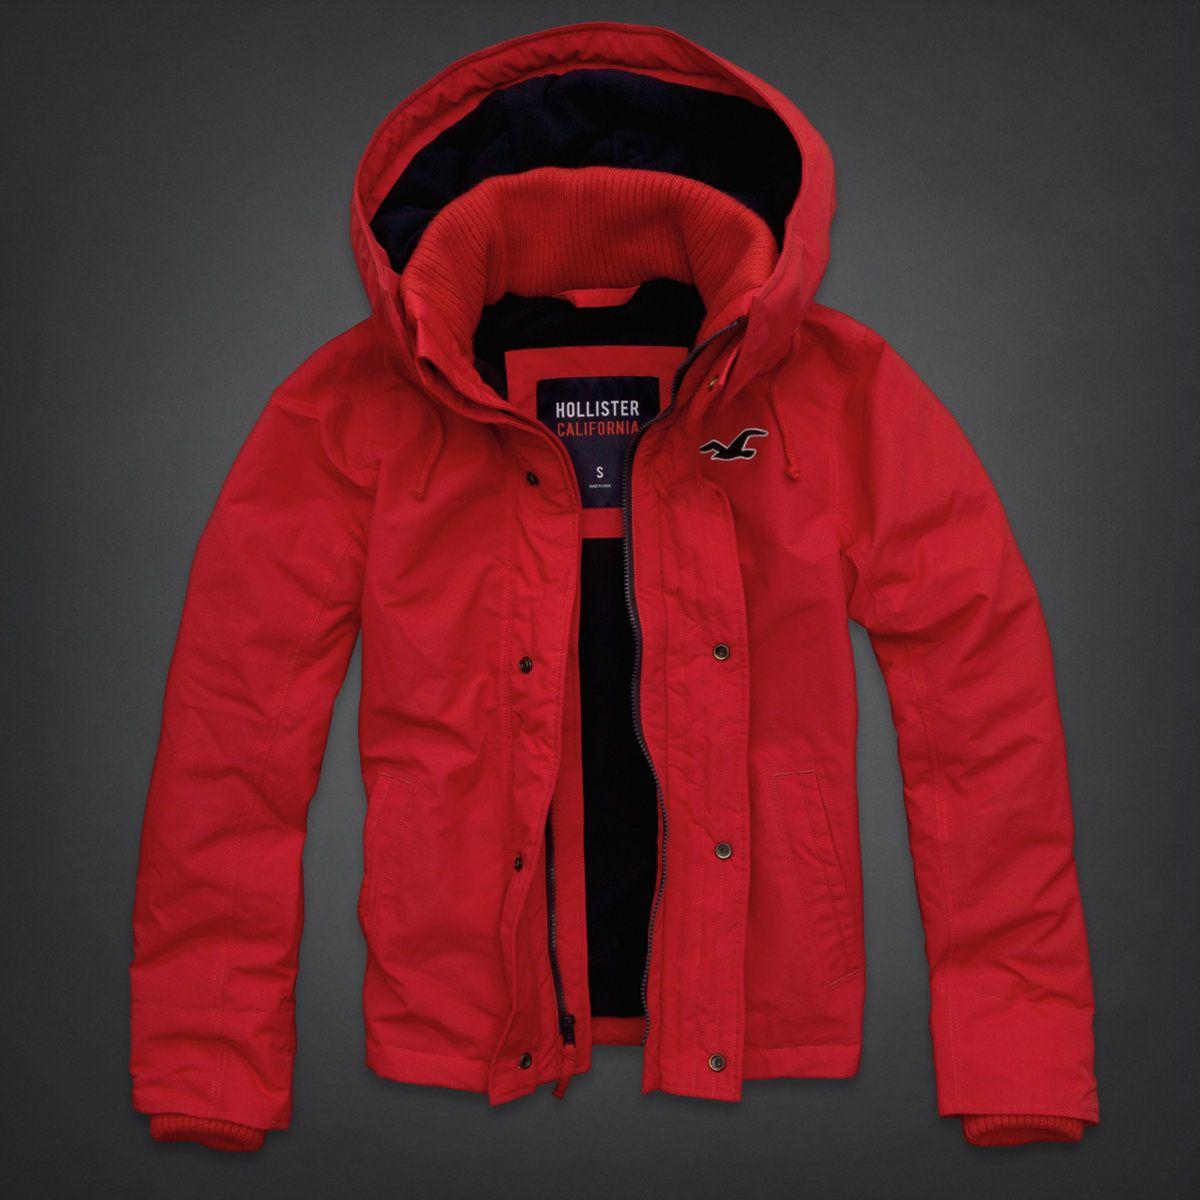 Dudes Hollister All-weather Jacket   Dudes Outerwear   Eu.HollisterCo.com   Menu0026#39;s Apparel ...